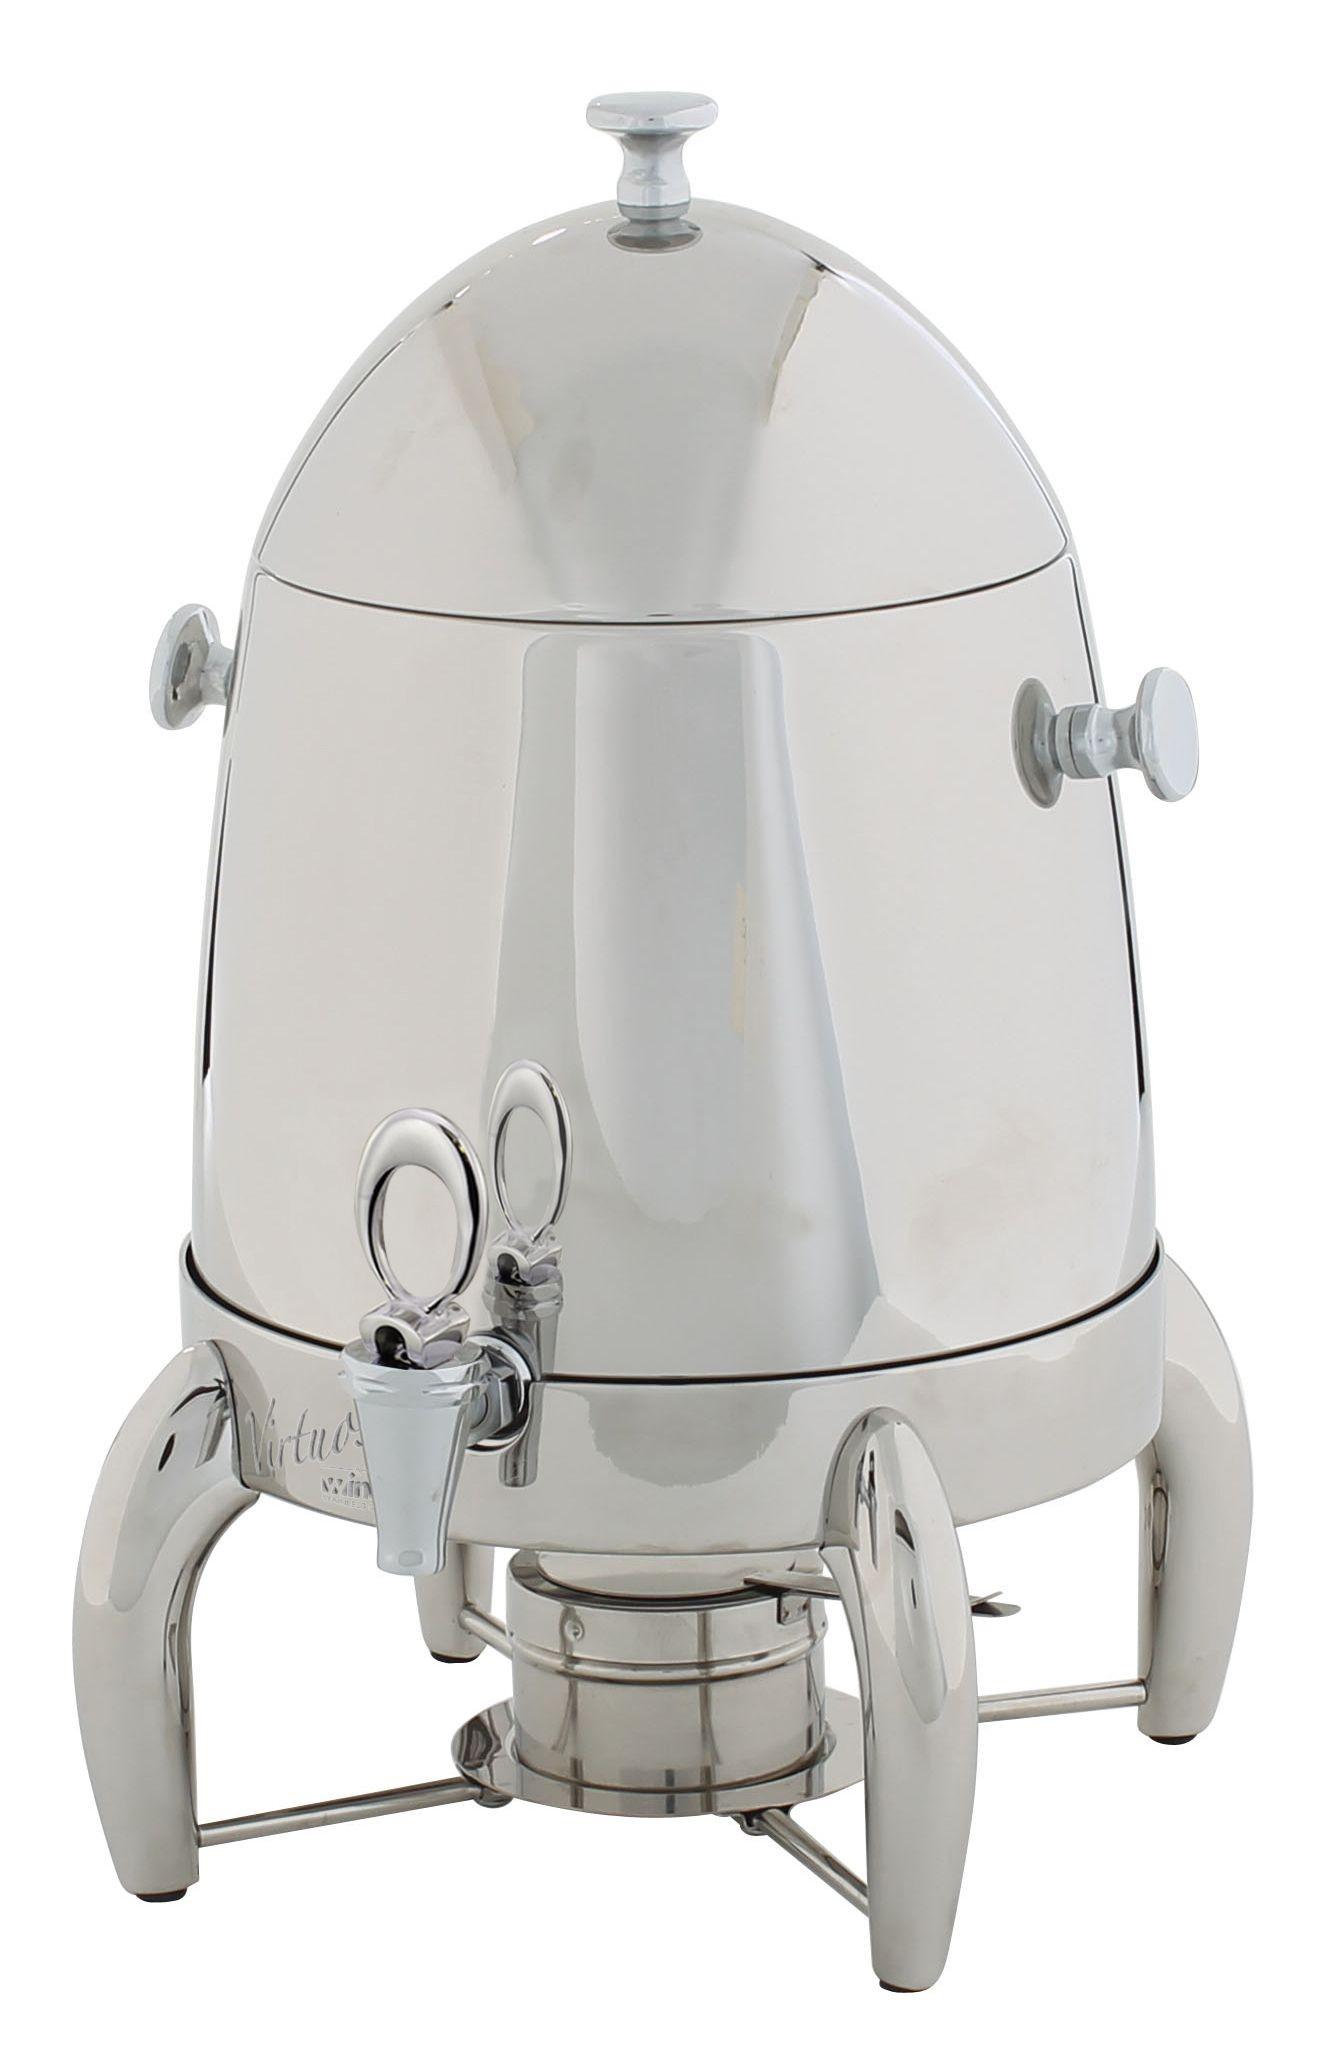 Winco 903B Virtuoso Stainless Steel Coffee Urn, 3 Gallon